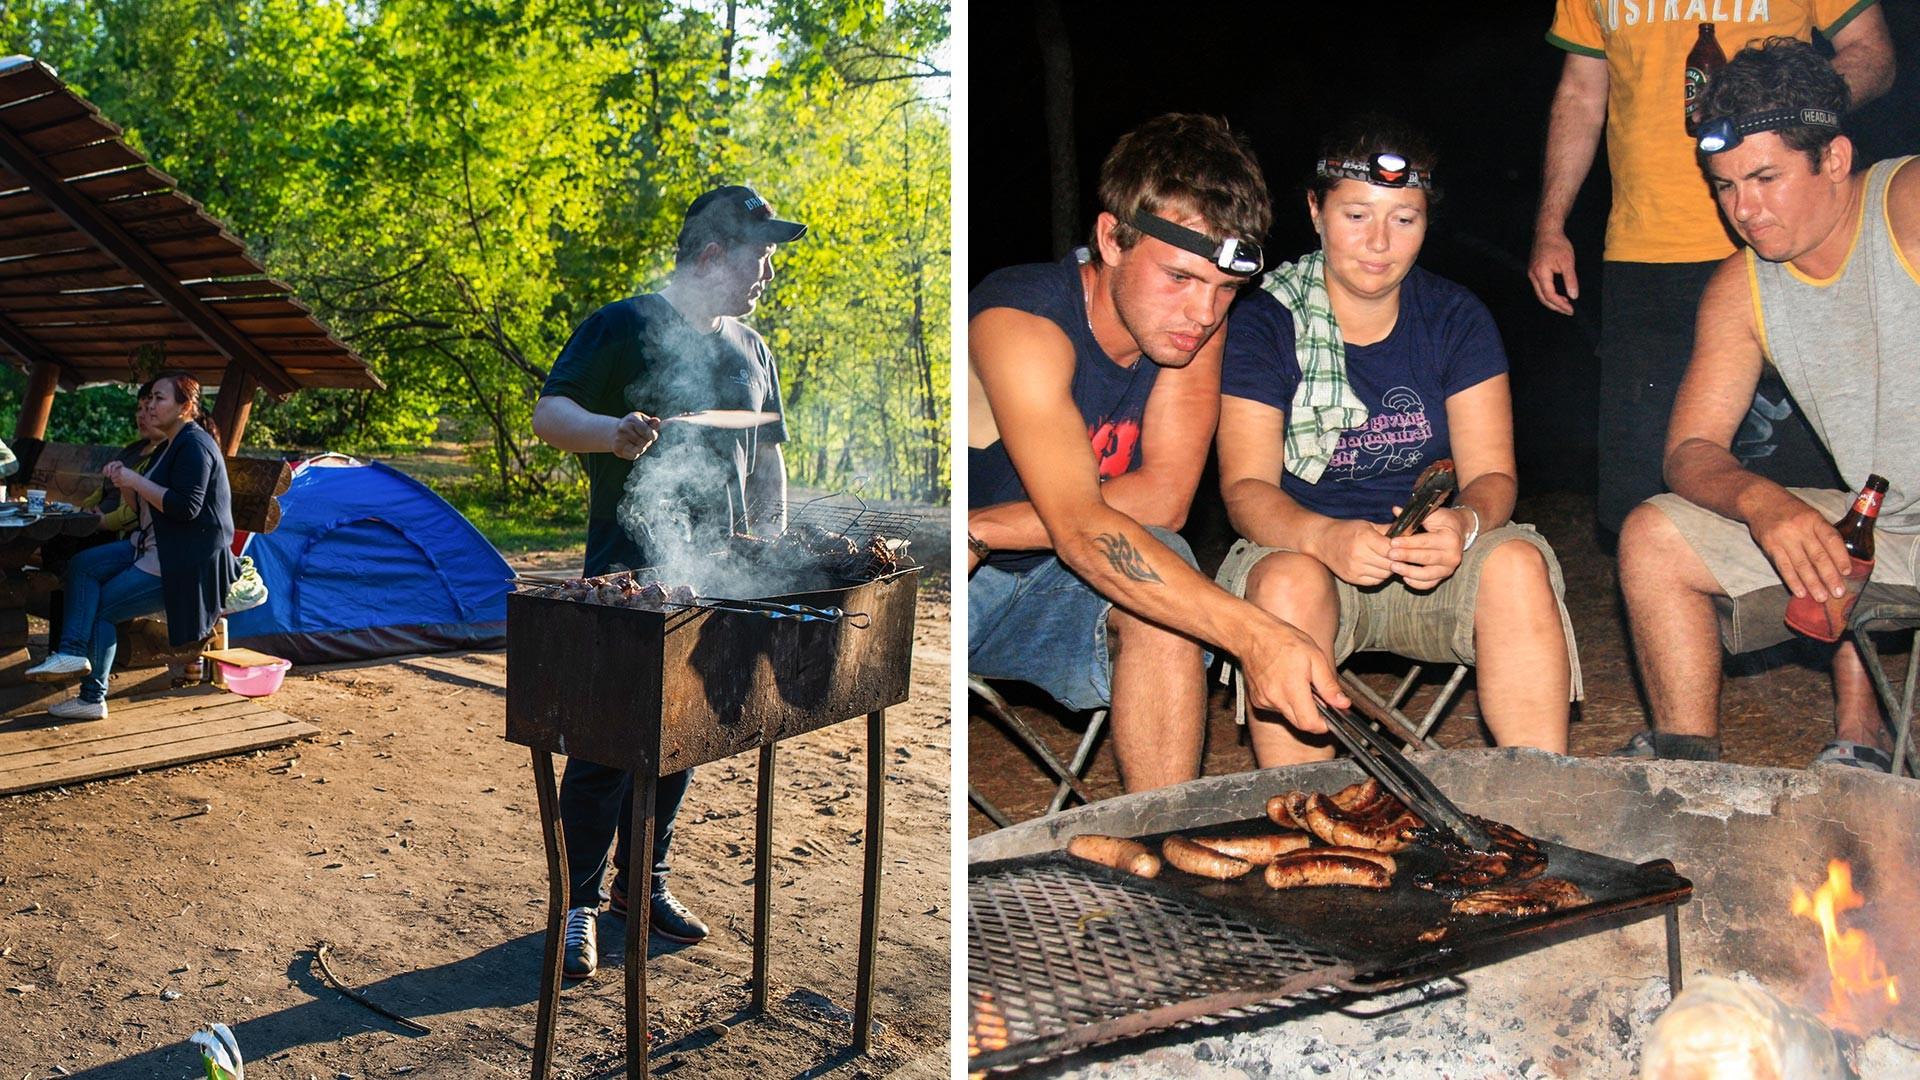 Warga Moskow memanggang shashlyk di taman (kiri) dan penduduk Australia membuat malam barbeku yang menyenangkan.